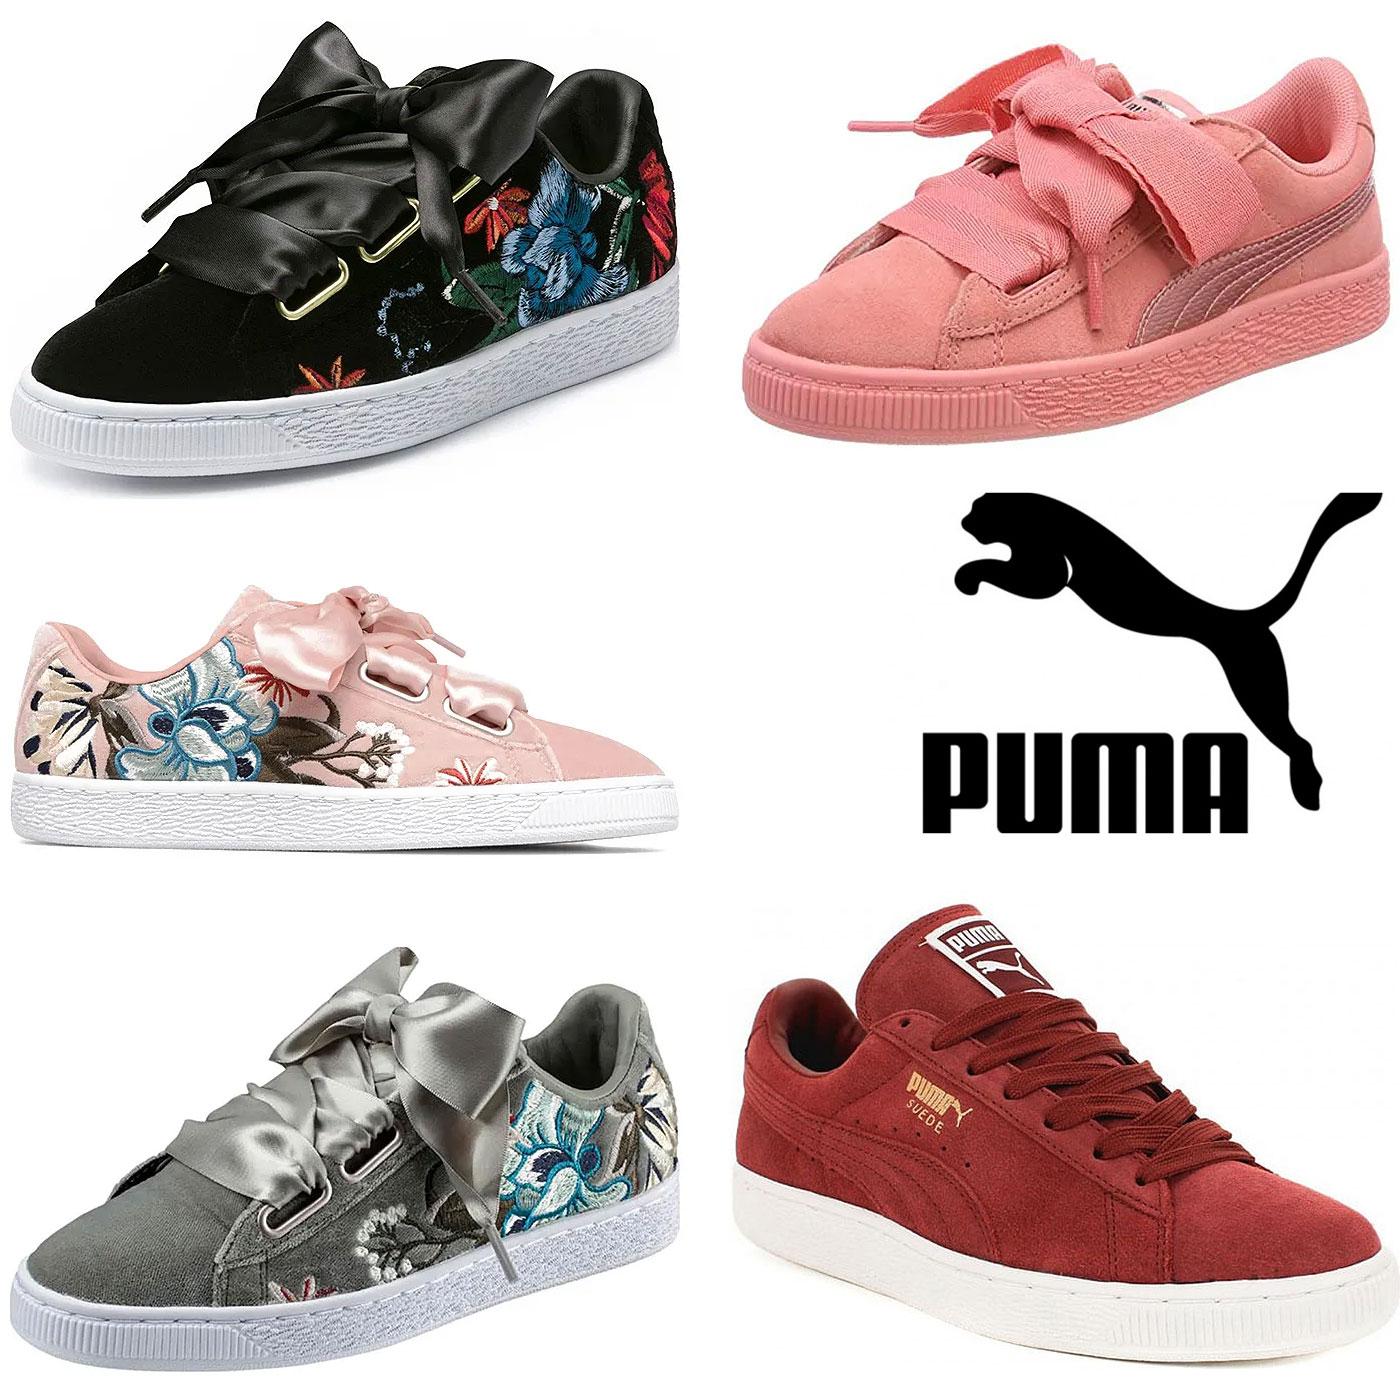 Puma met hoge korting (tot -78%) + evt €10 extra @ Limango